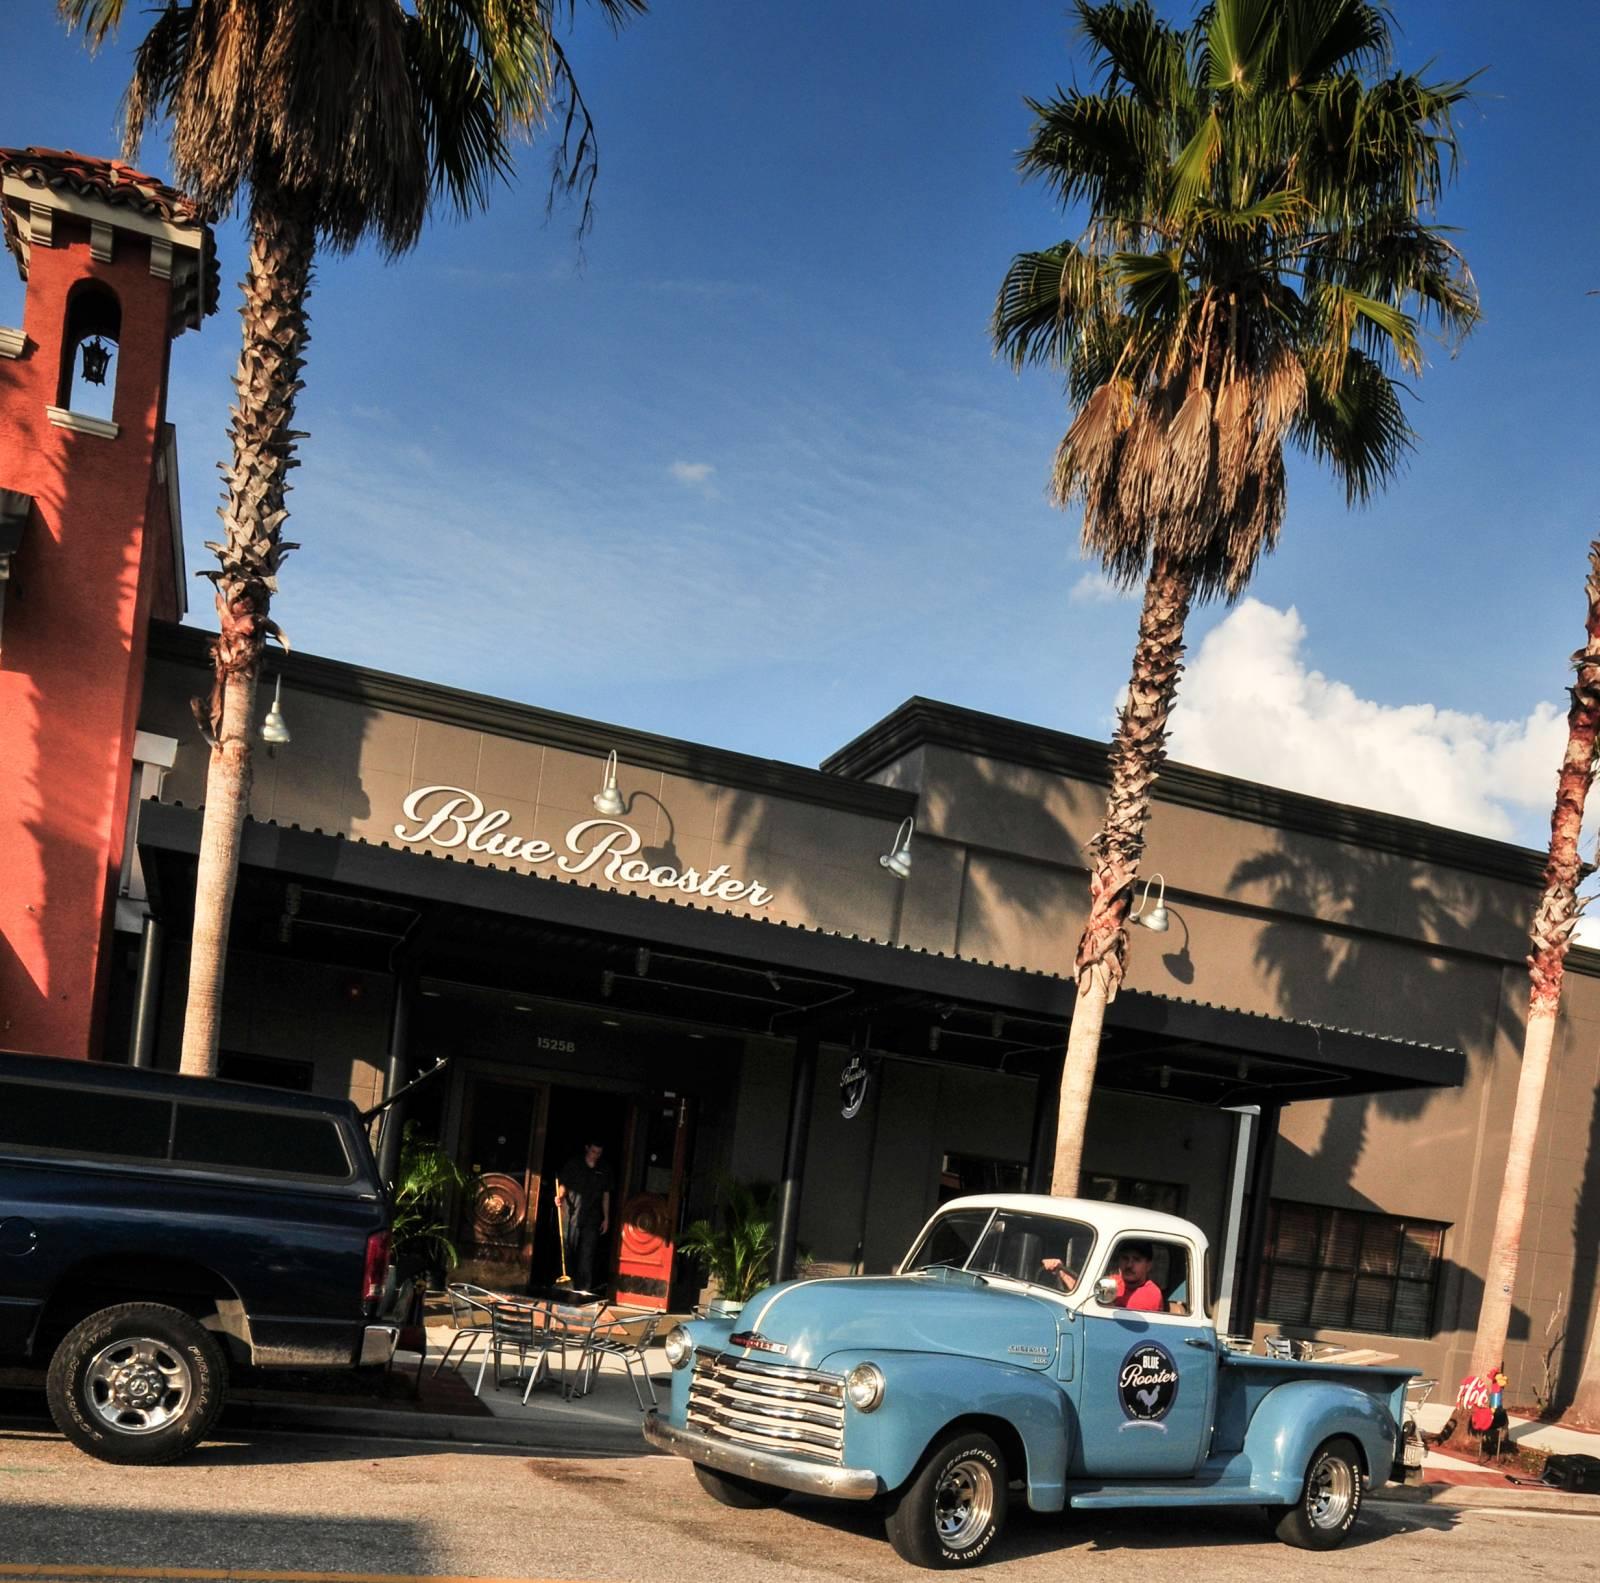 Exterior of the Blue Rooster bar restaurant downtown Sarasota, Florida.